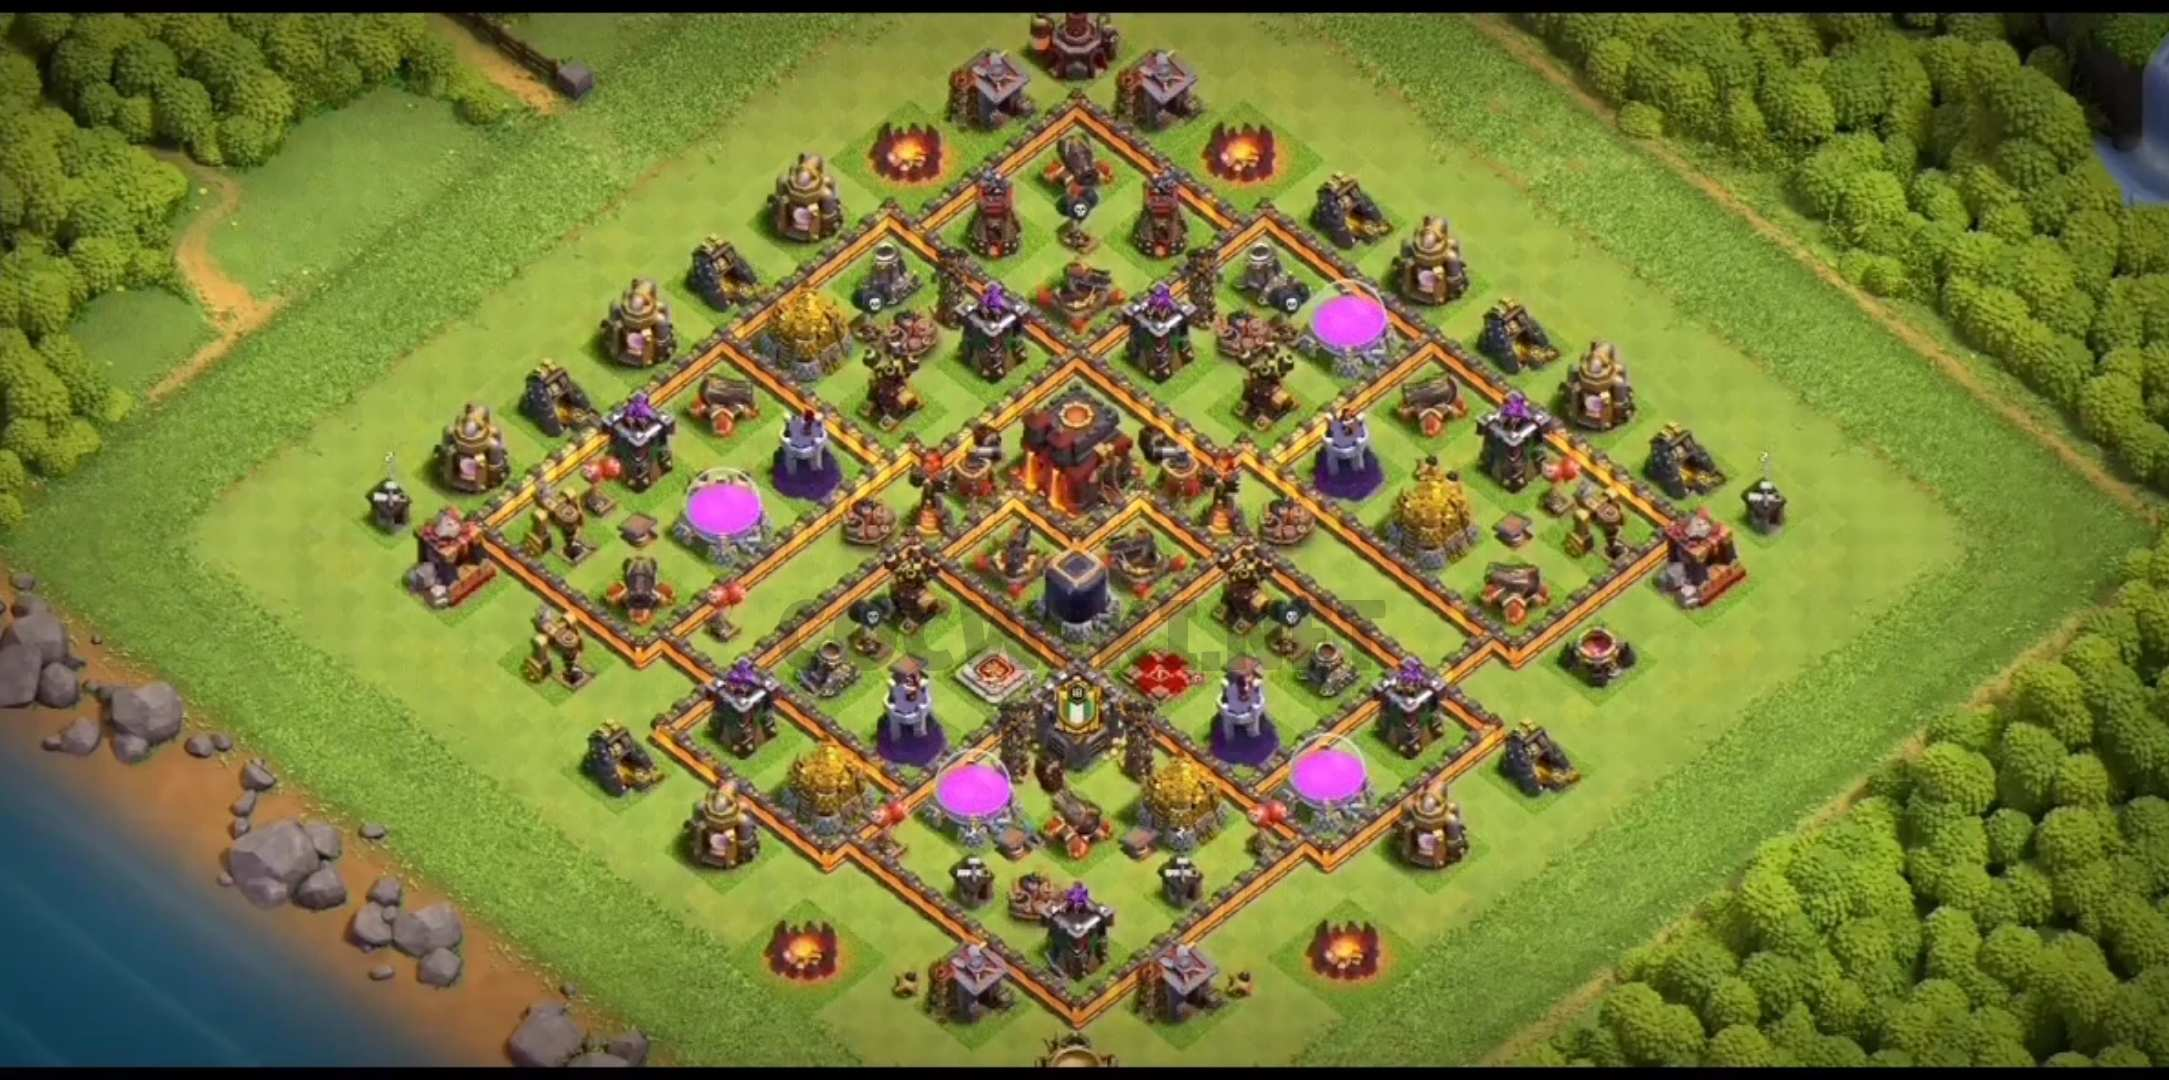 coc th10 farming base link